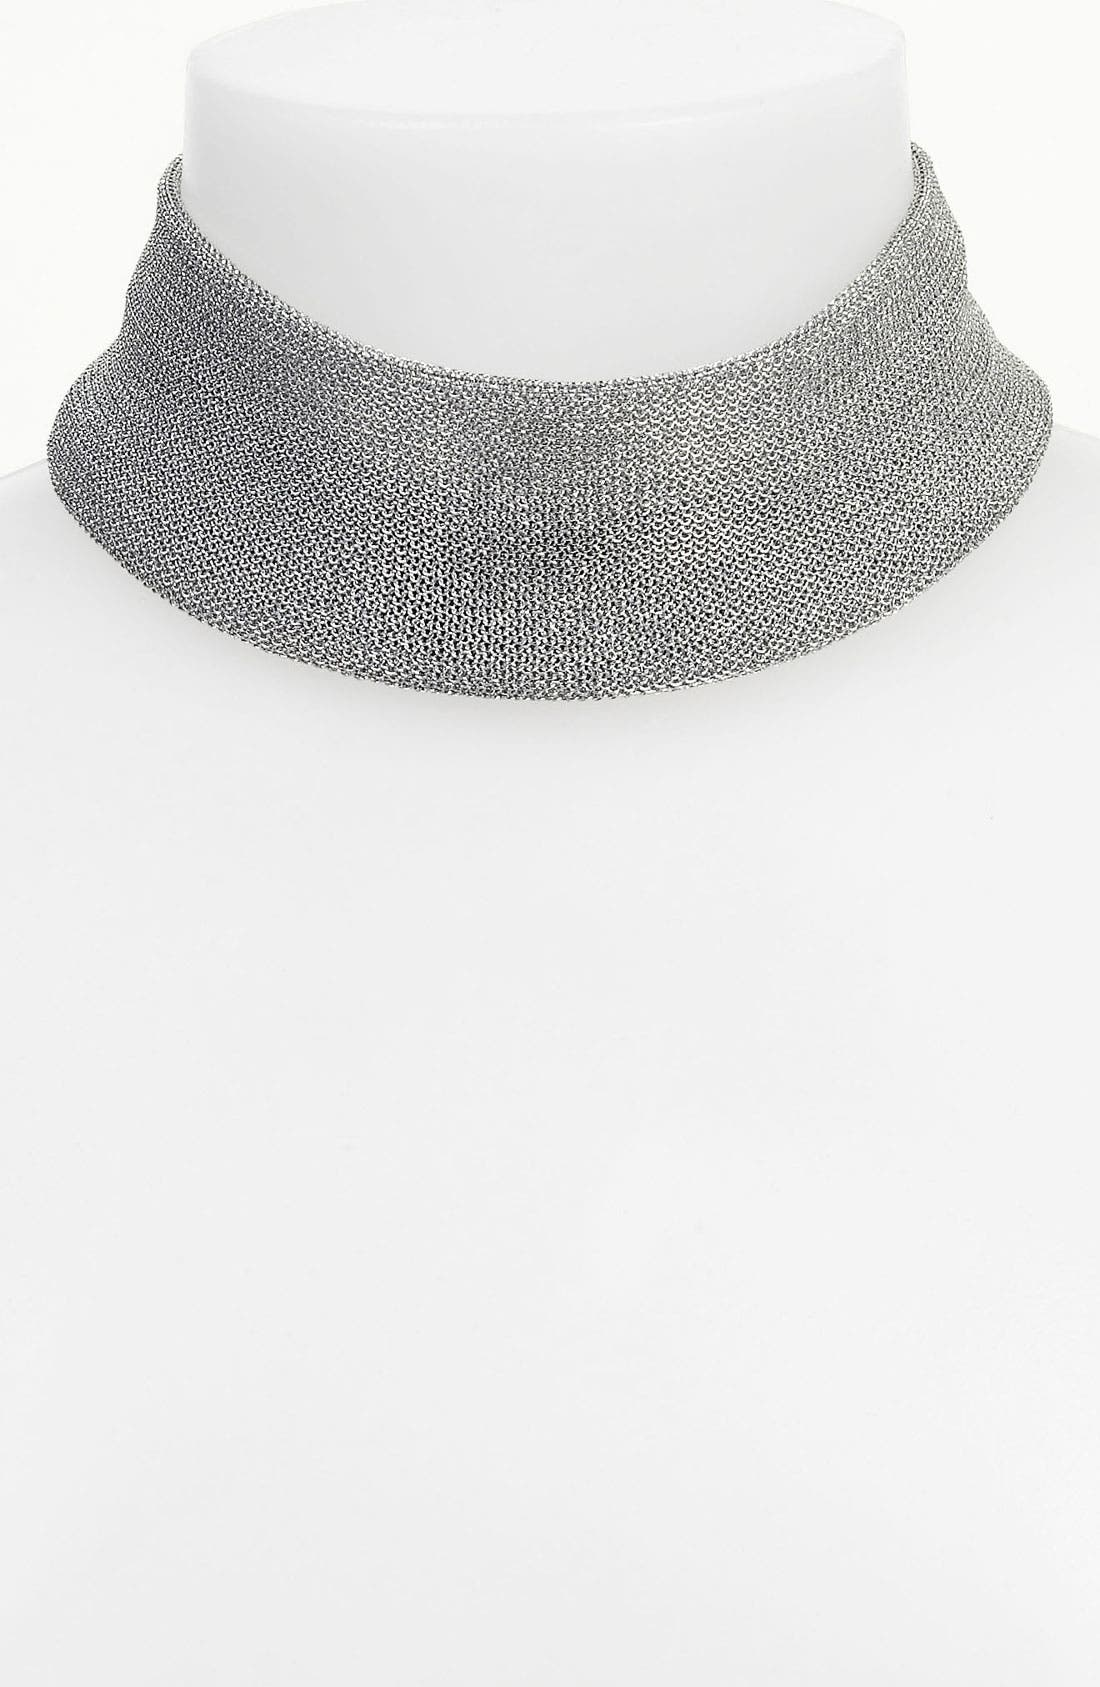 Alternate Image 4  - Adami & Martucci 'Mesh' Collar Necklace (Nordstrom Exclusive)